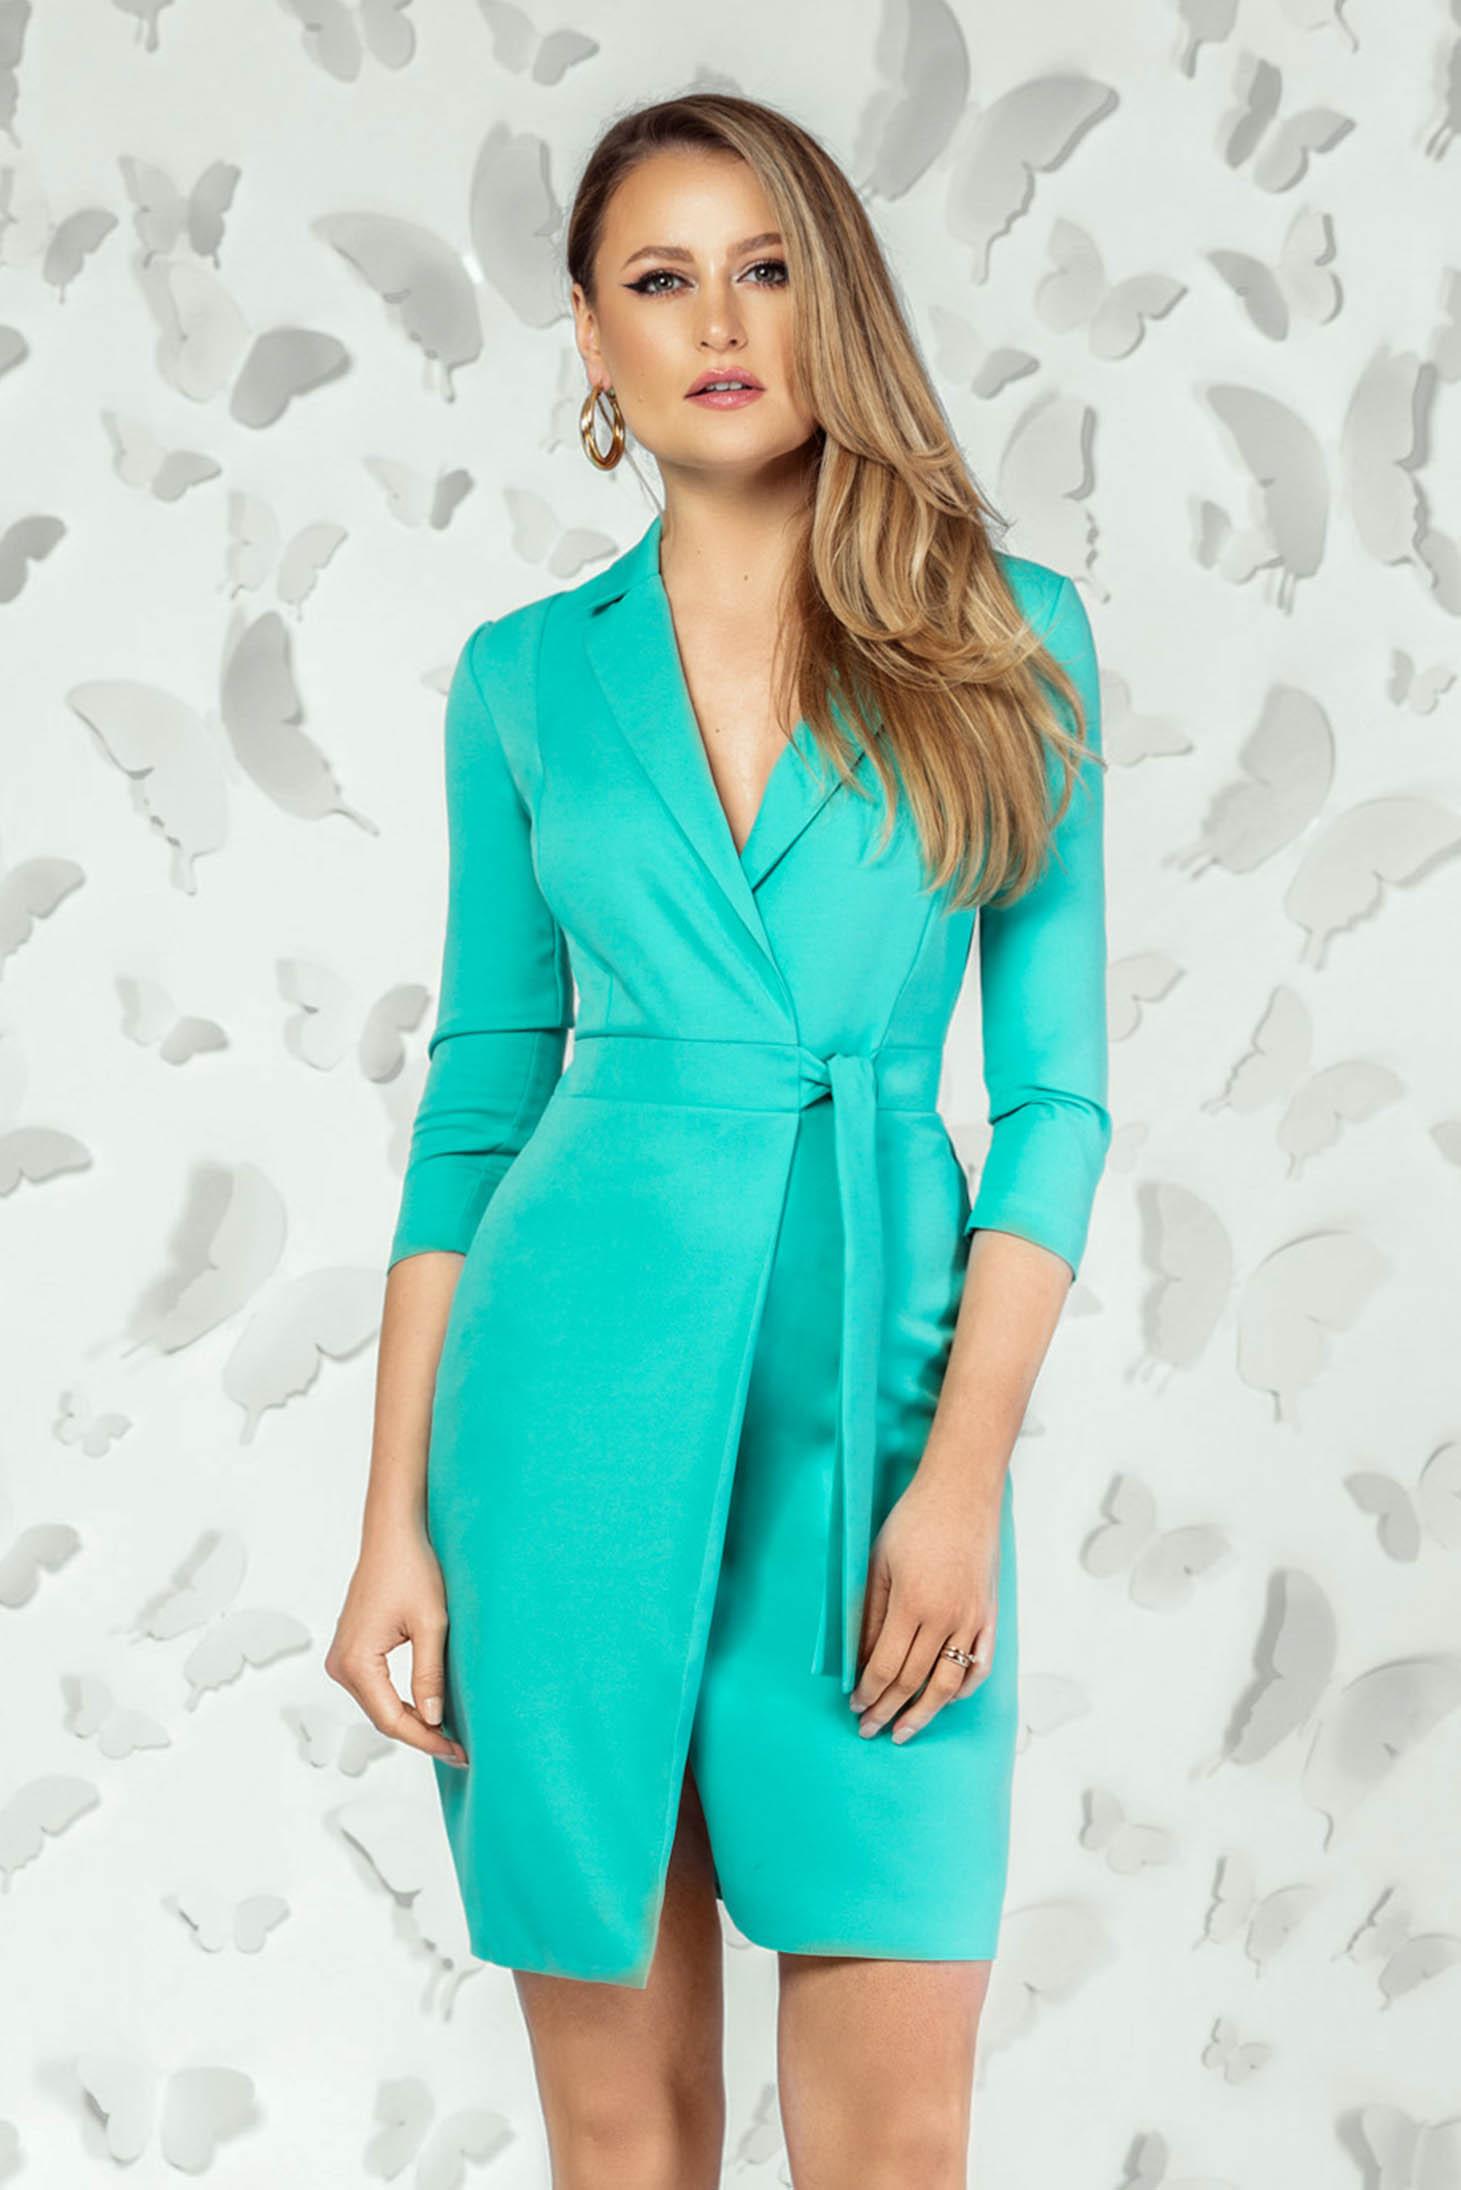 Lightgreen dress elegant short cut pencil with v-neckline with 3/4 sleeves